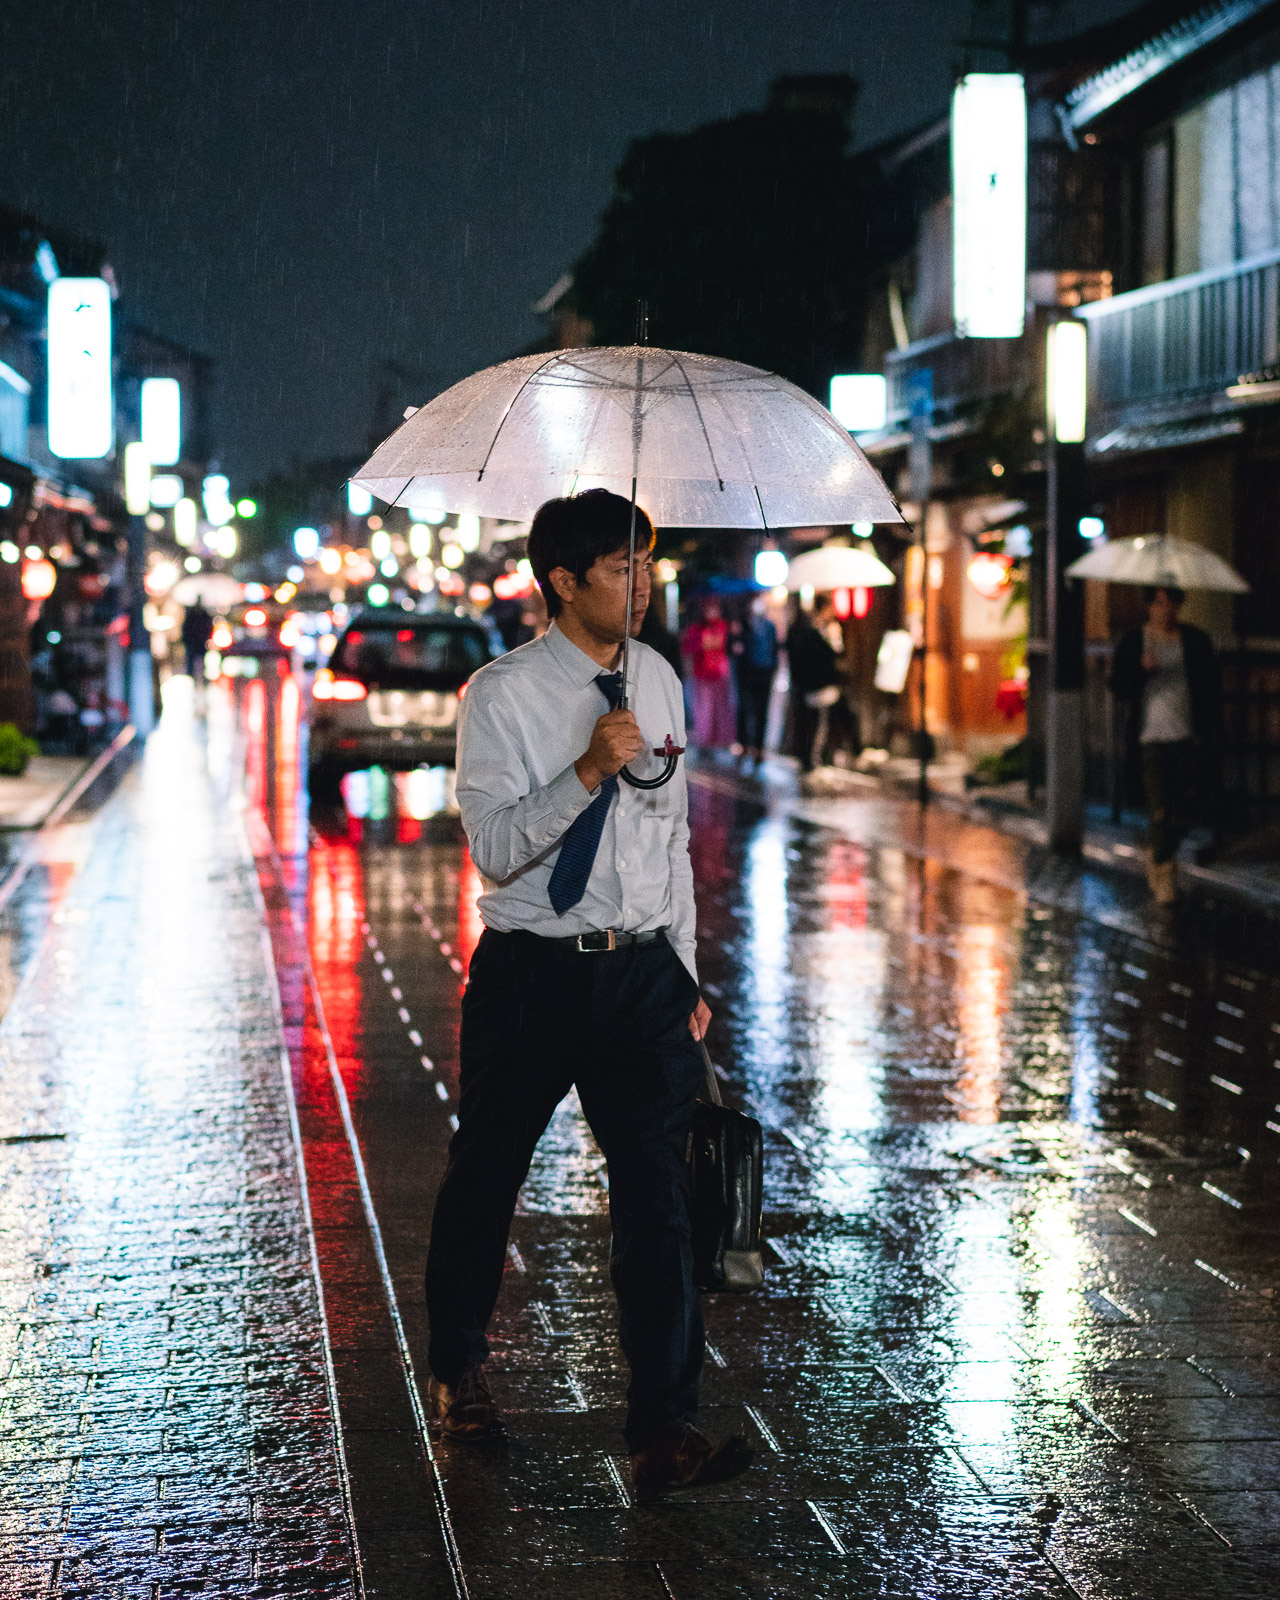 Japan-Street-Photography-People-13.jpg